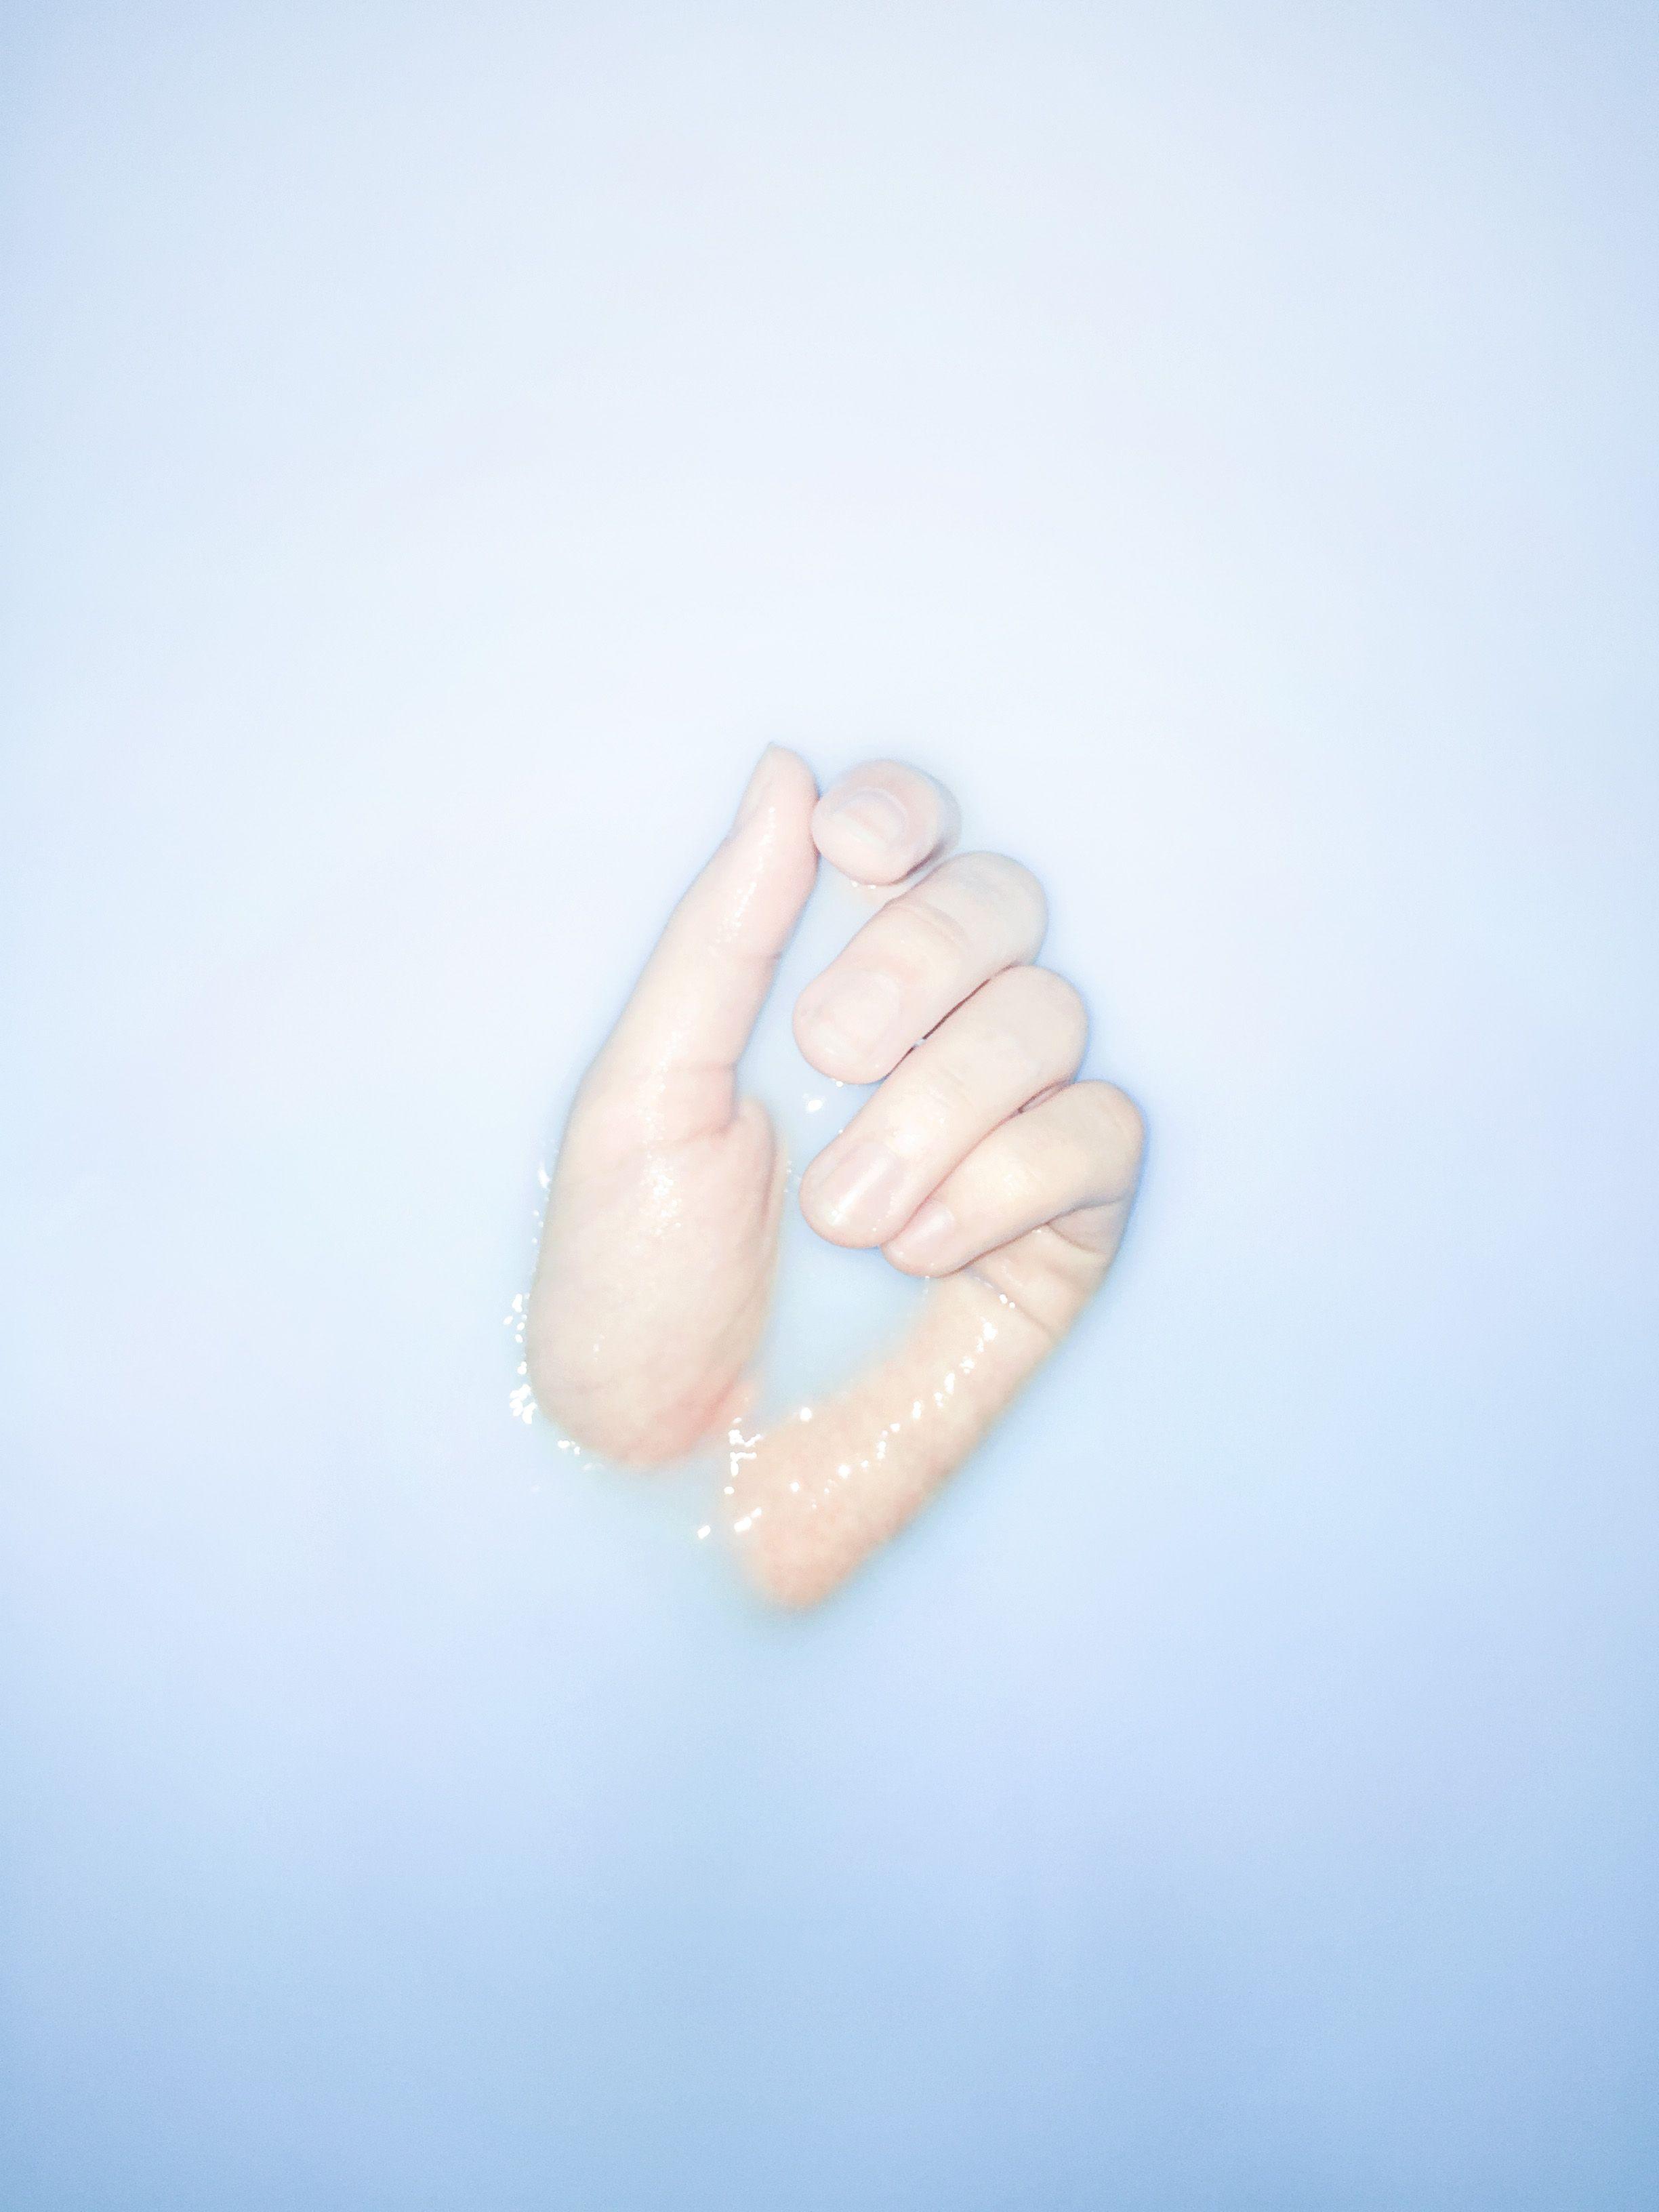 Water, Hand / 20141112  Copyright ⓒ Paramc #Blue #Color #Ar#Designt